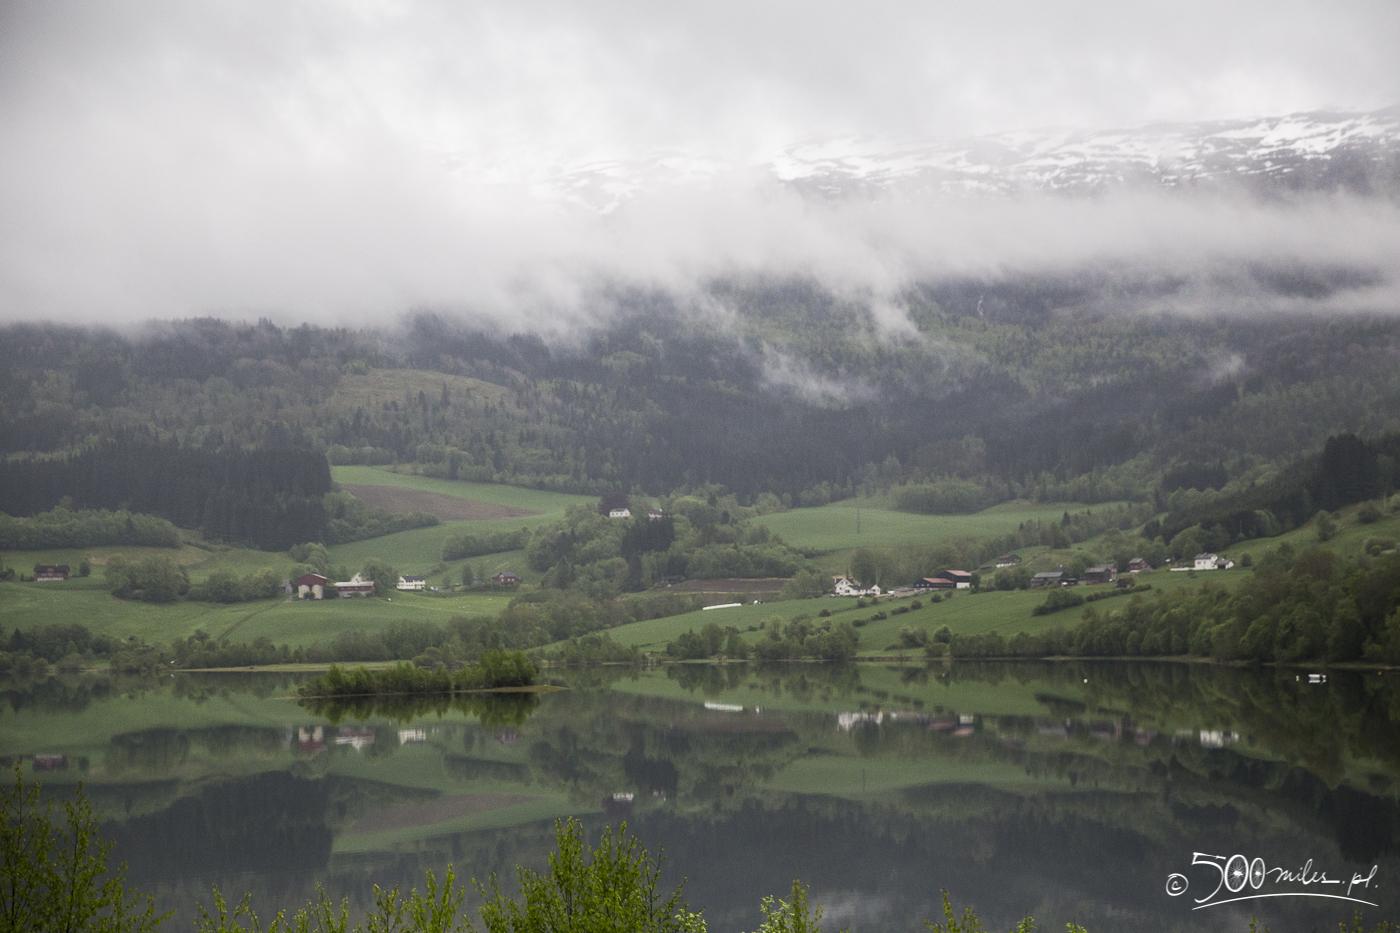 Oslo-Bergen train ride - lake view